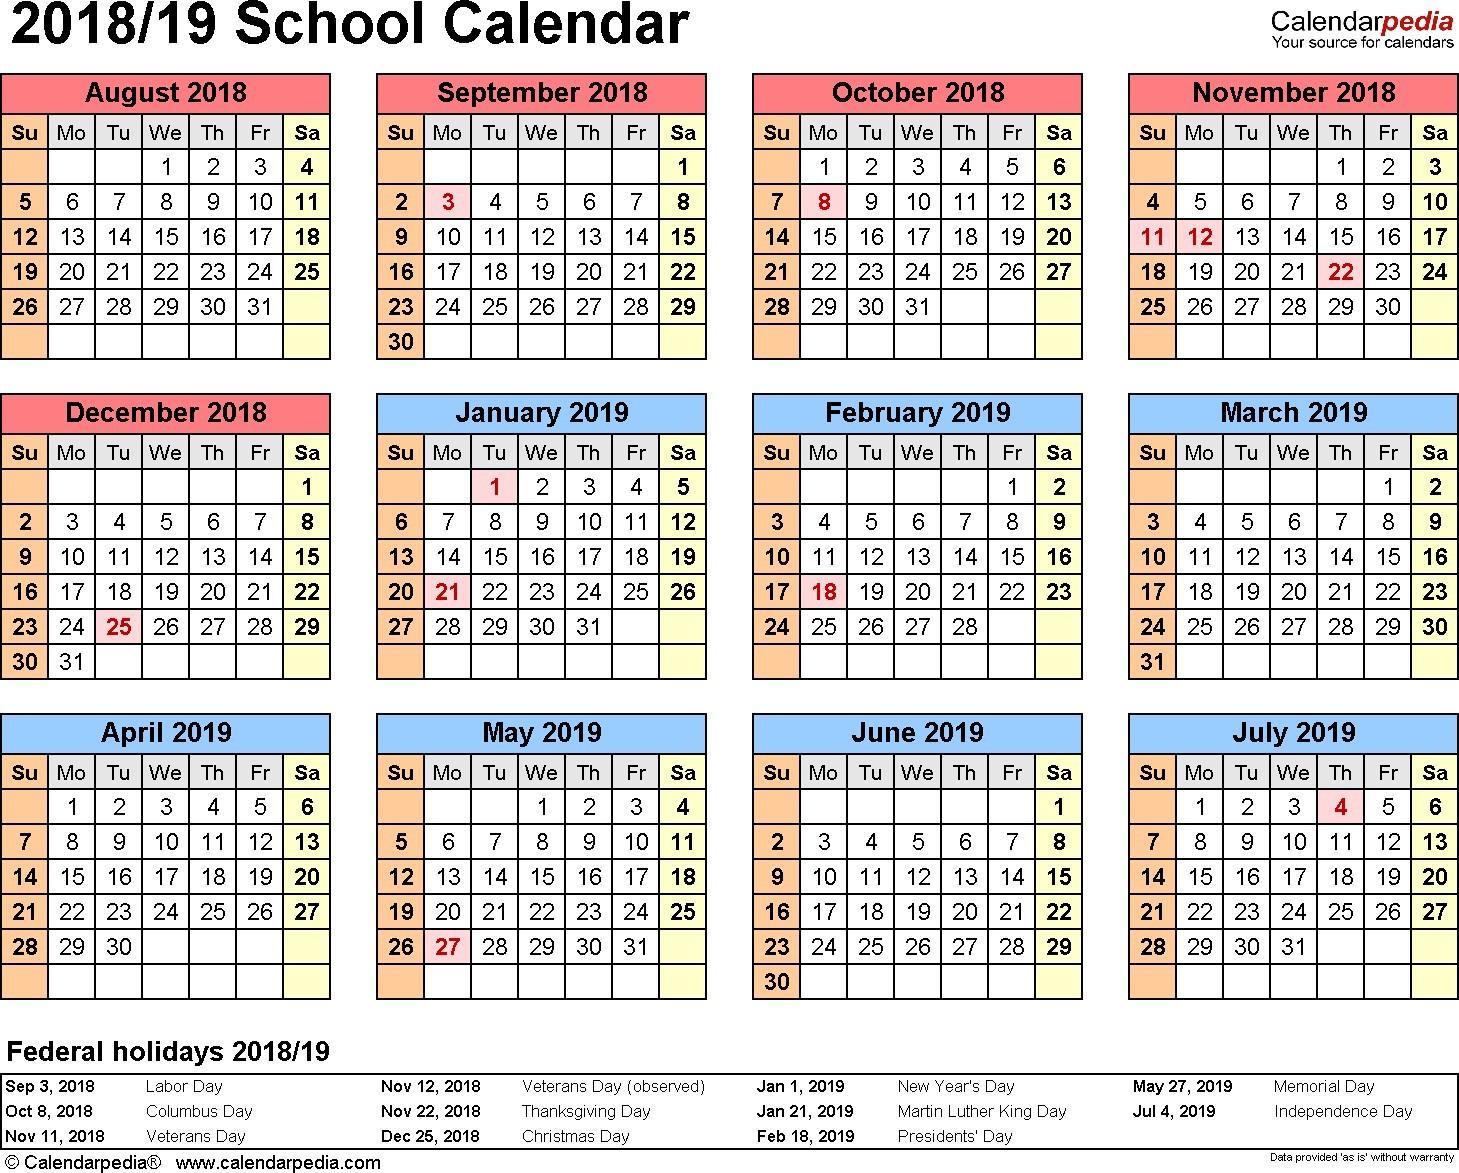 Best Printable School Calendar 2019 15